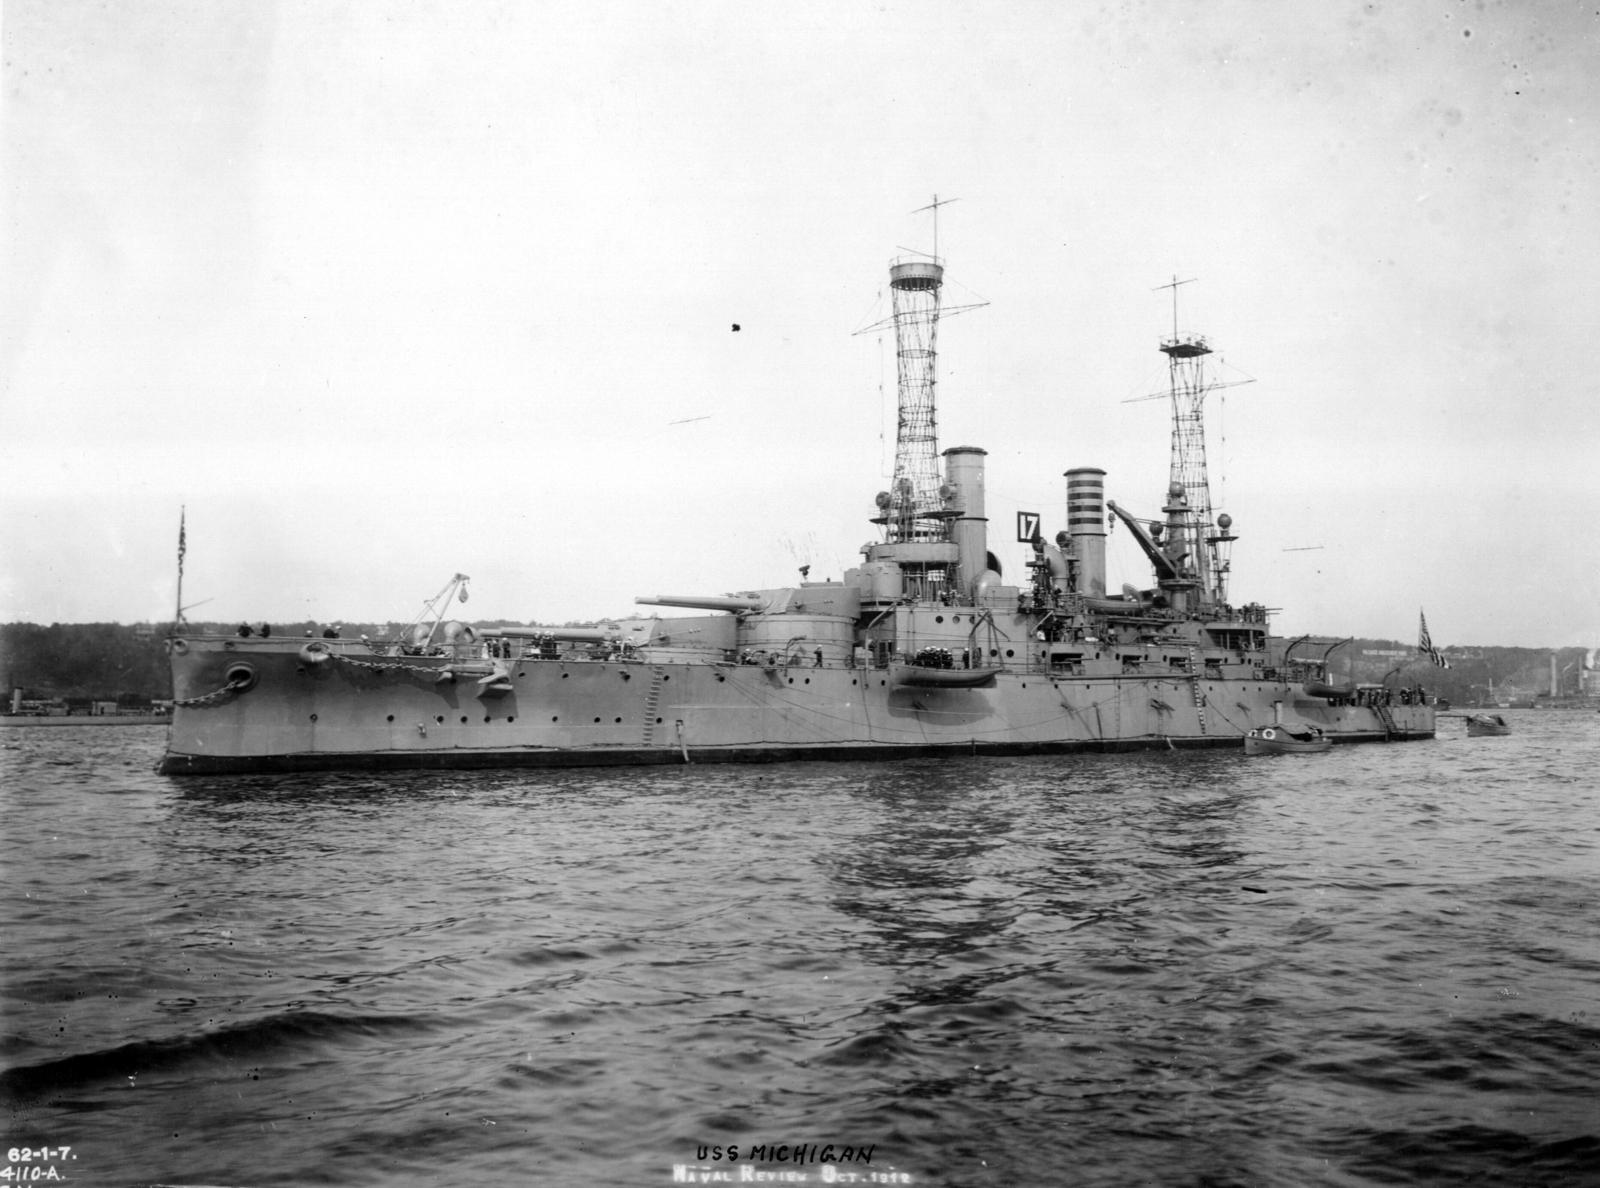 Photograph of the Battleship USS Michigan